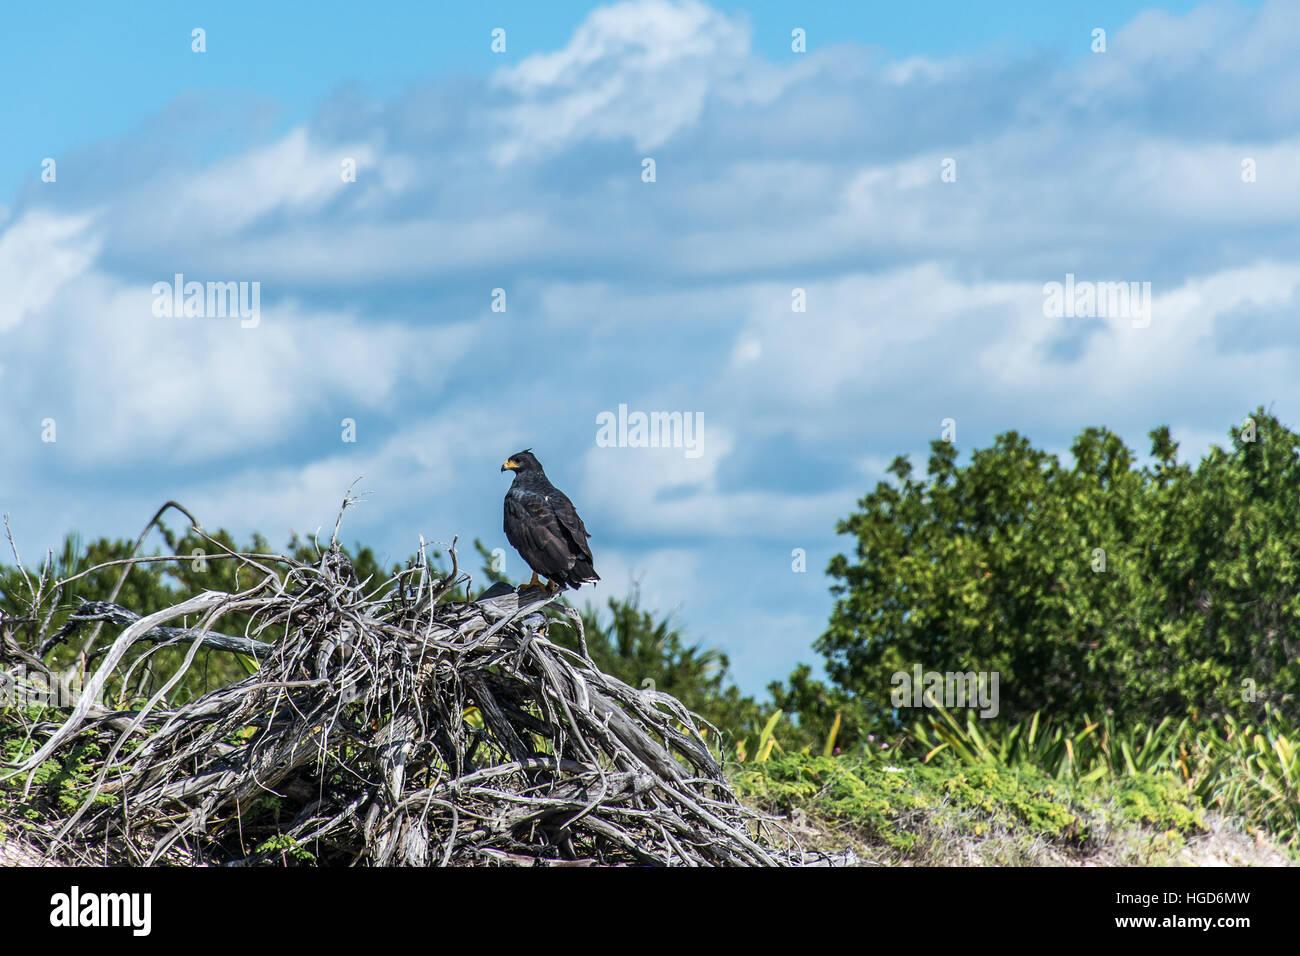 Hawk free falcon wildlife bird in mexico yucatan - Stock Image